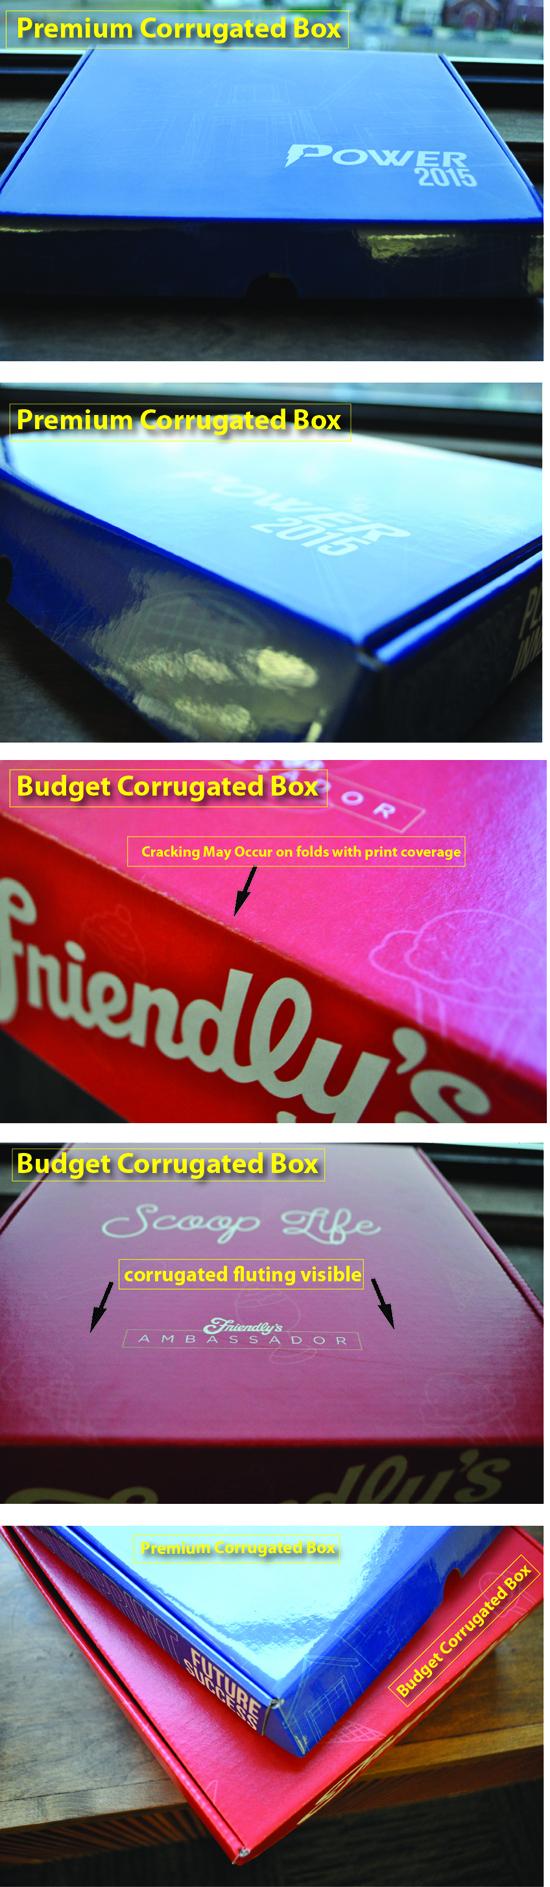 Premium vs Budget Corrugated boxes